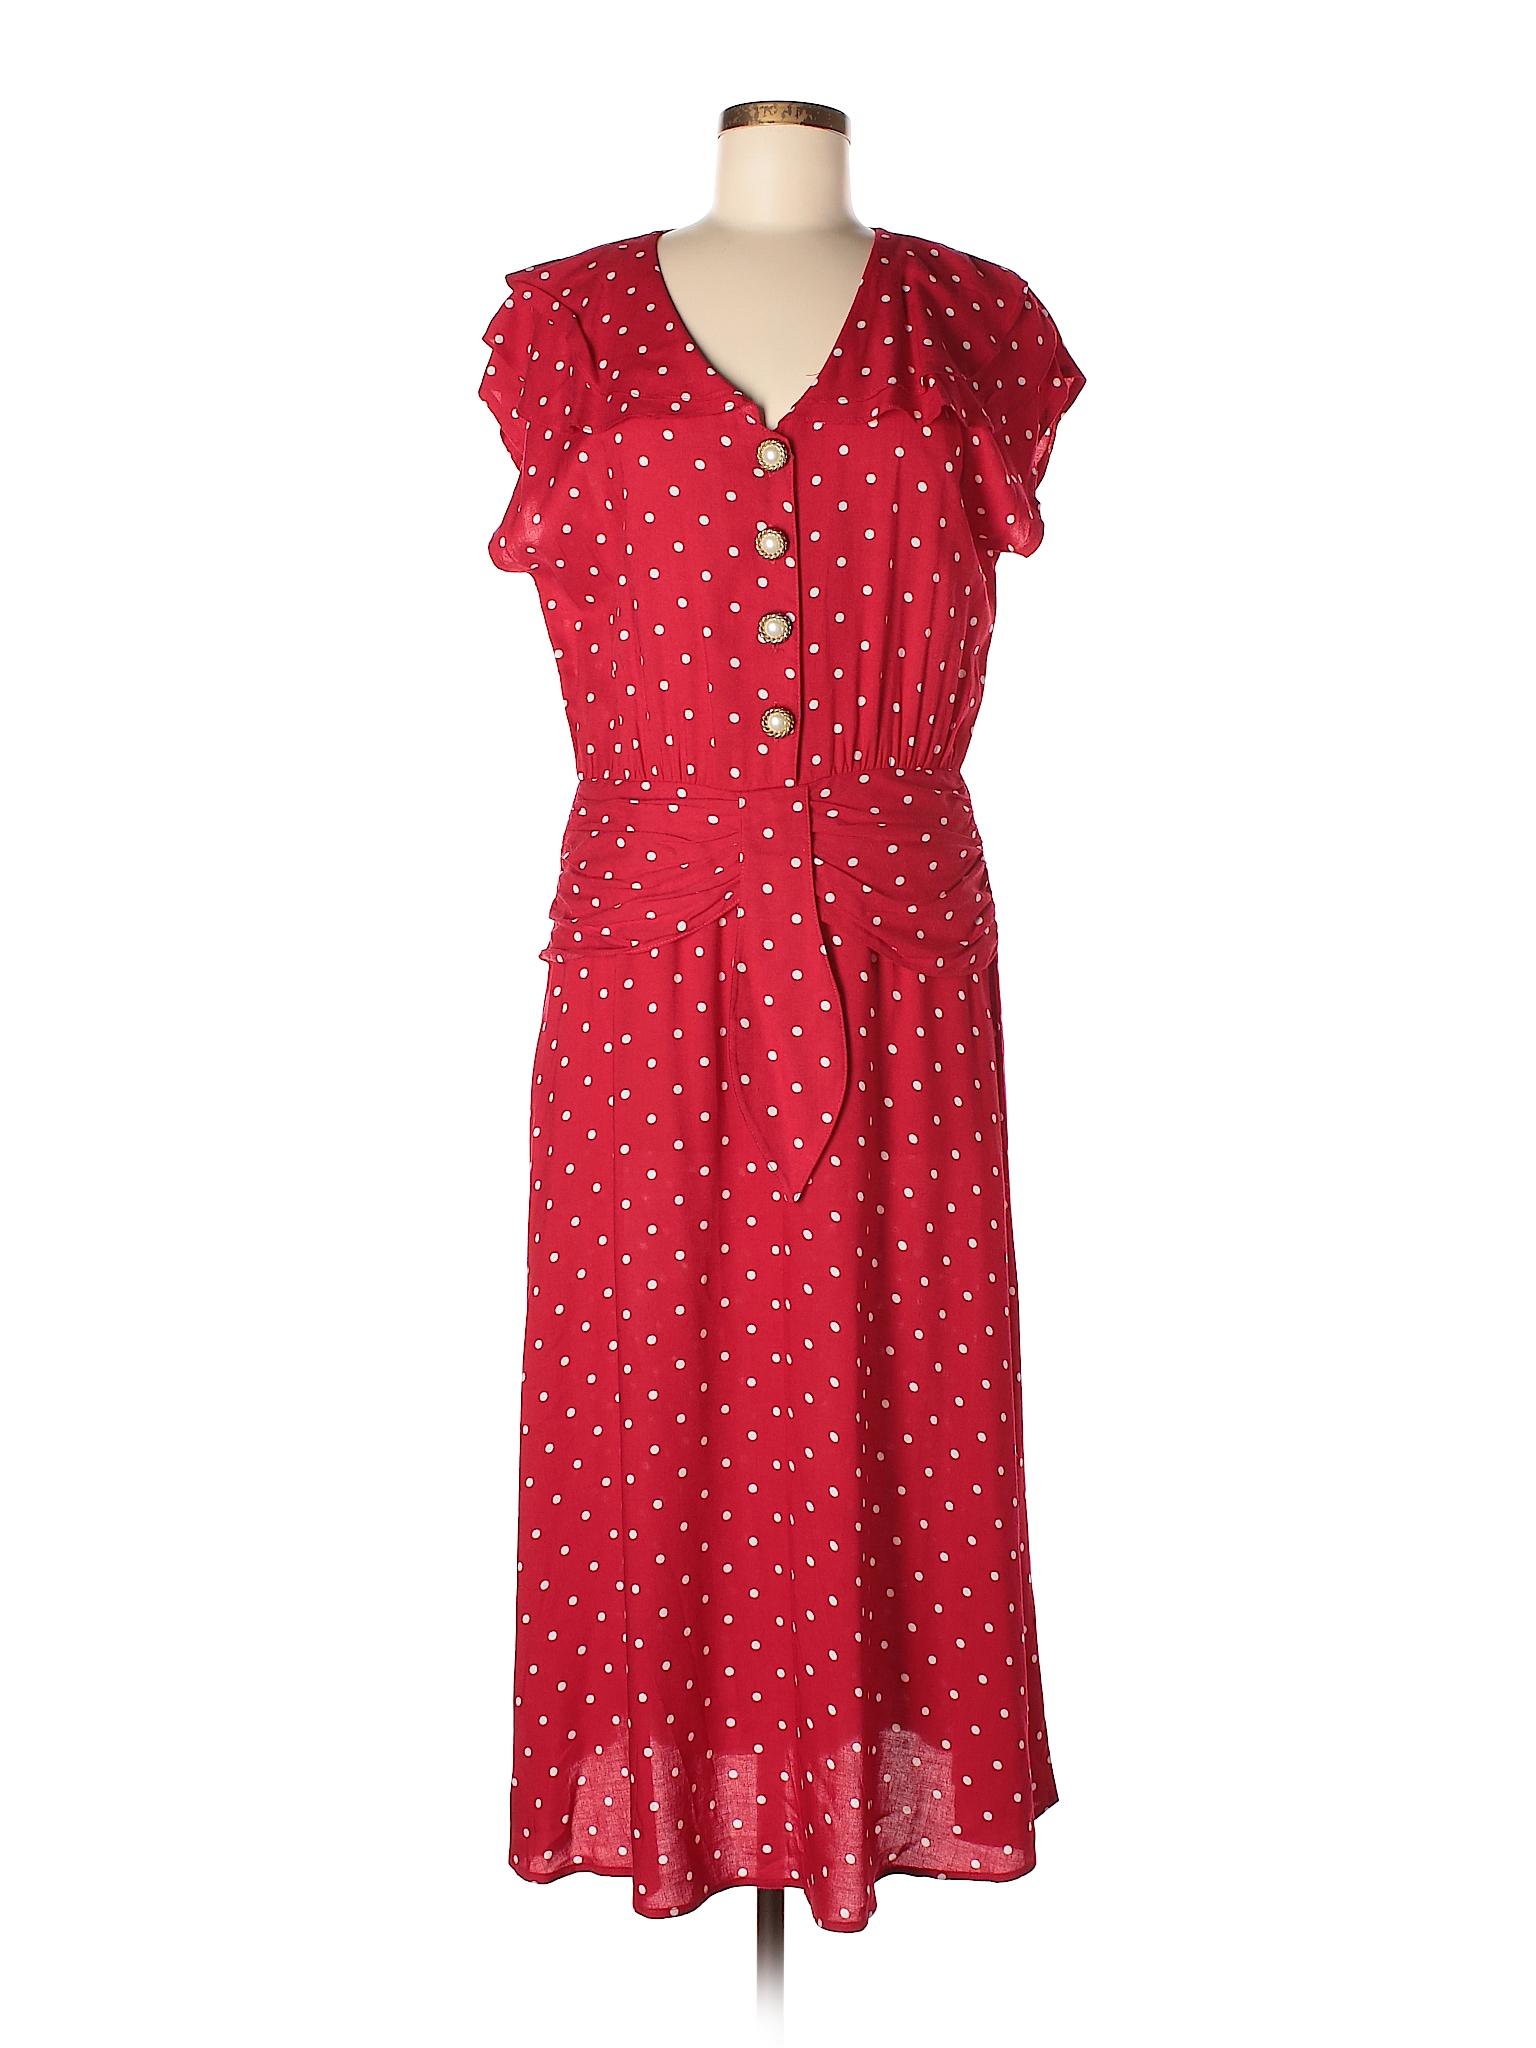 Selling Dress Piccalino Piccalino Nina Casual Selling Nina q8wSfzxEw